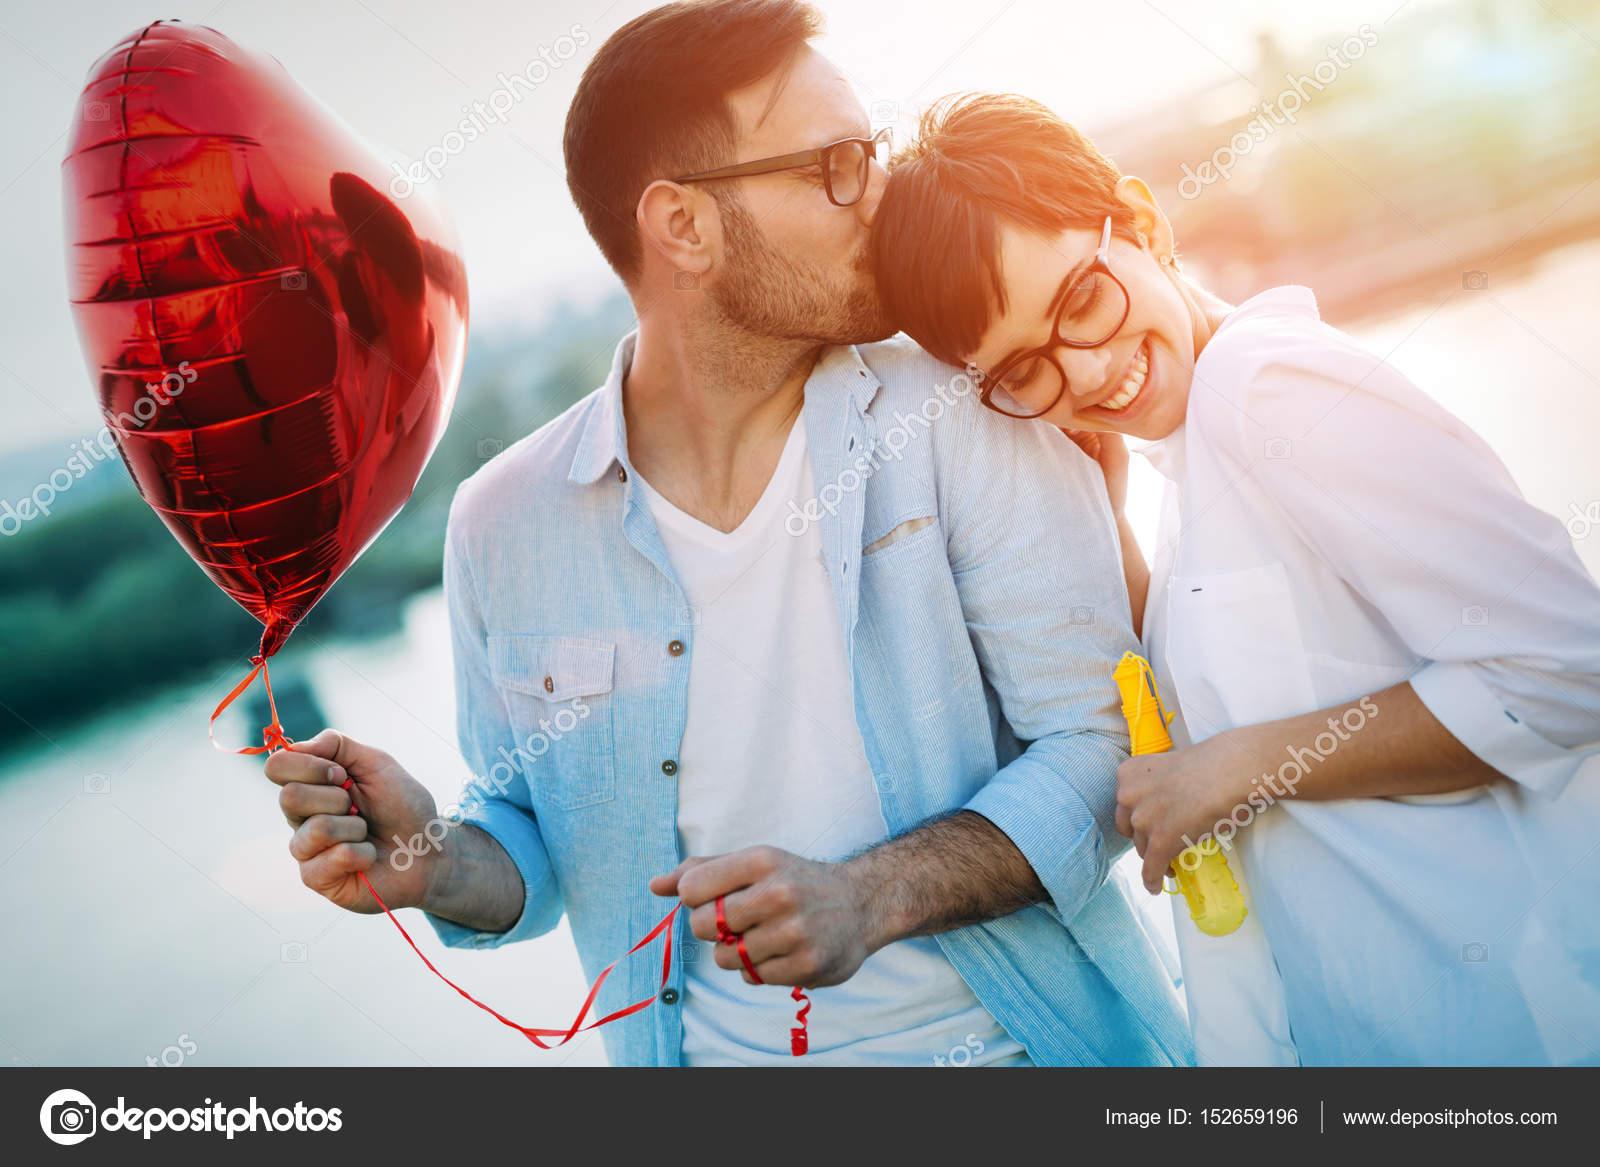 Романтические знакомства любовь знакомство по интернету хорошо или плохо